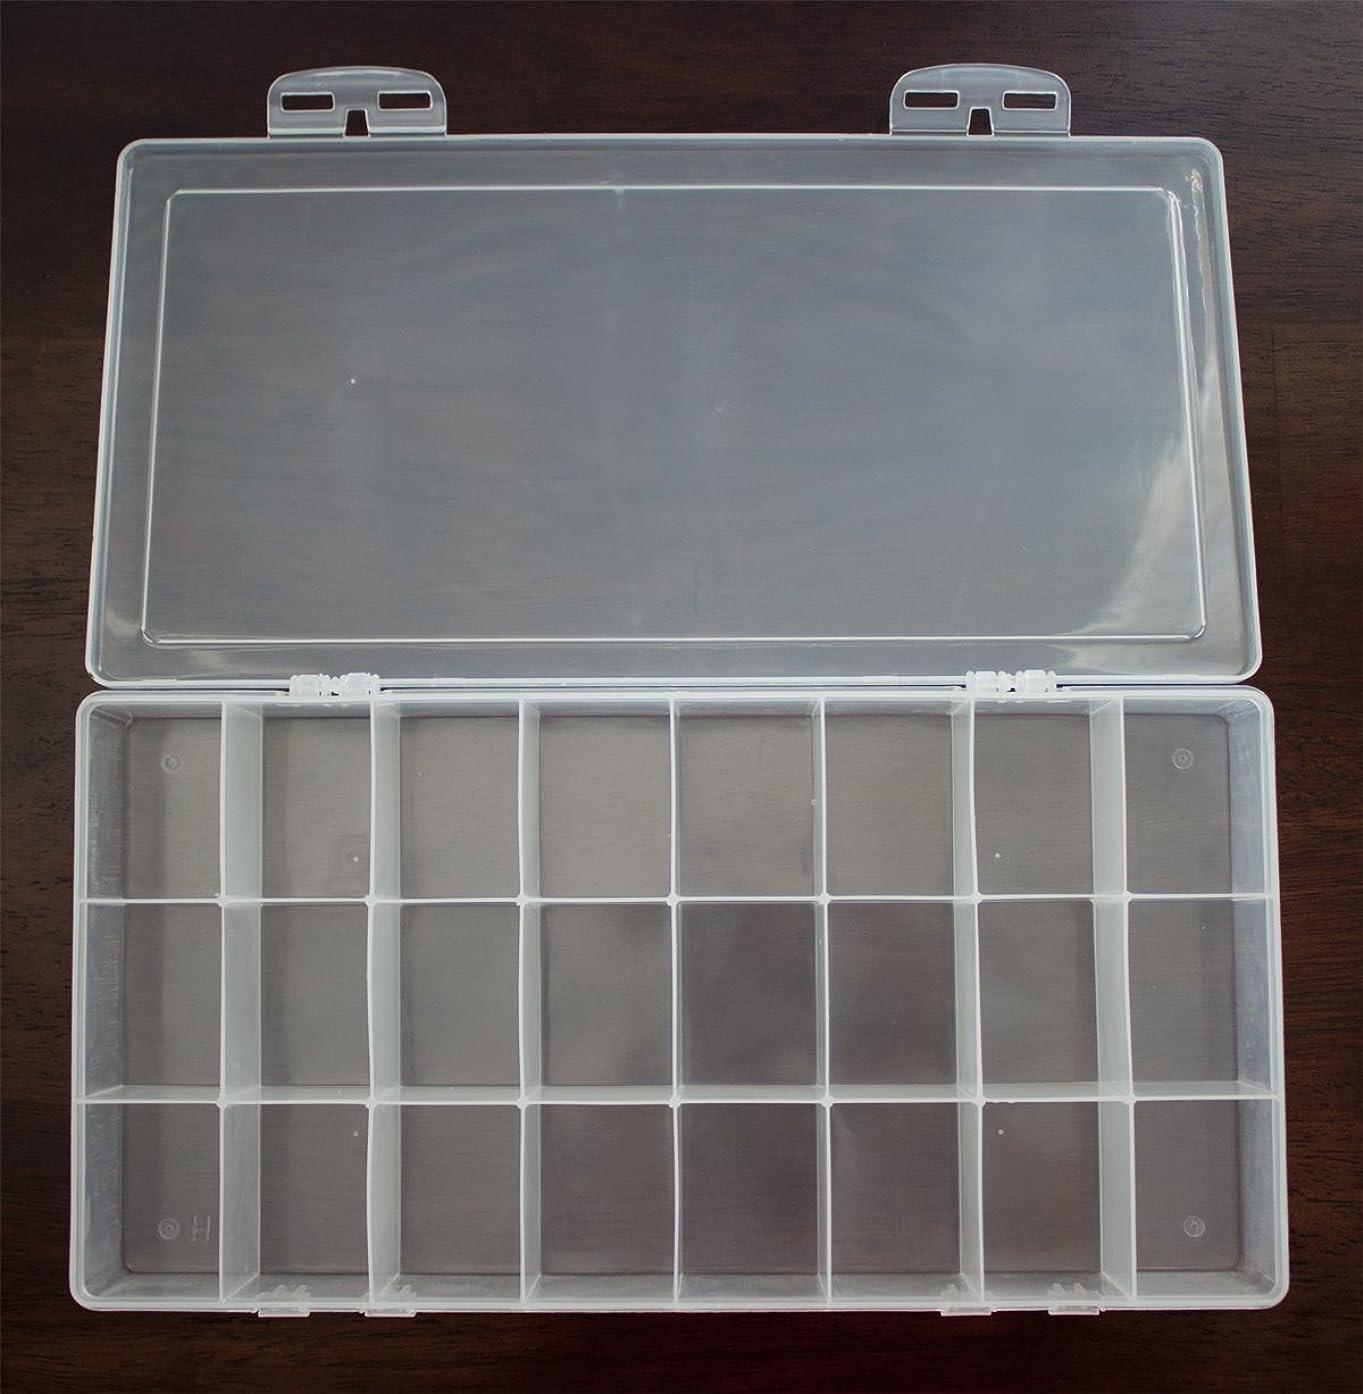 Rectangular Transparent Plastic Watercolor Palette Box, Jewelry Box Multi Purpose Organizer Storage Container (24 rectangular wells)